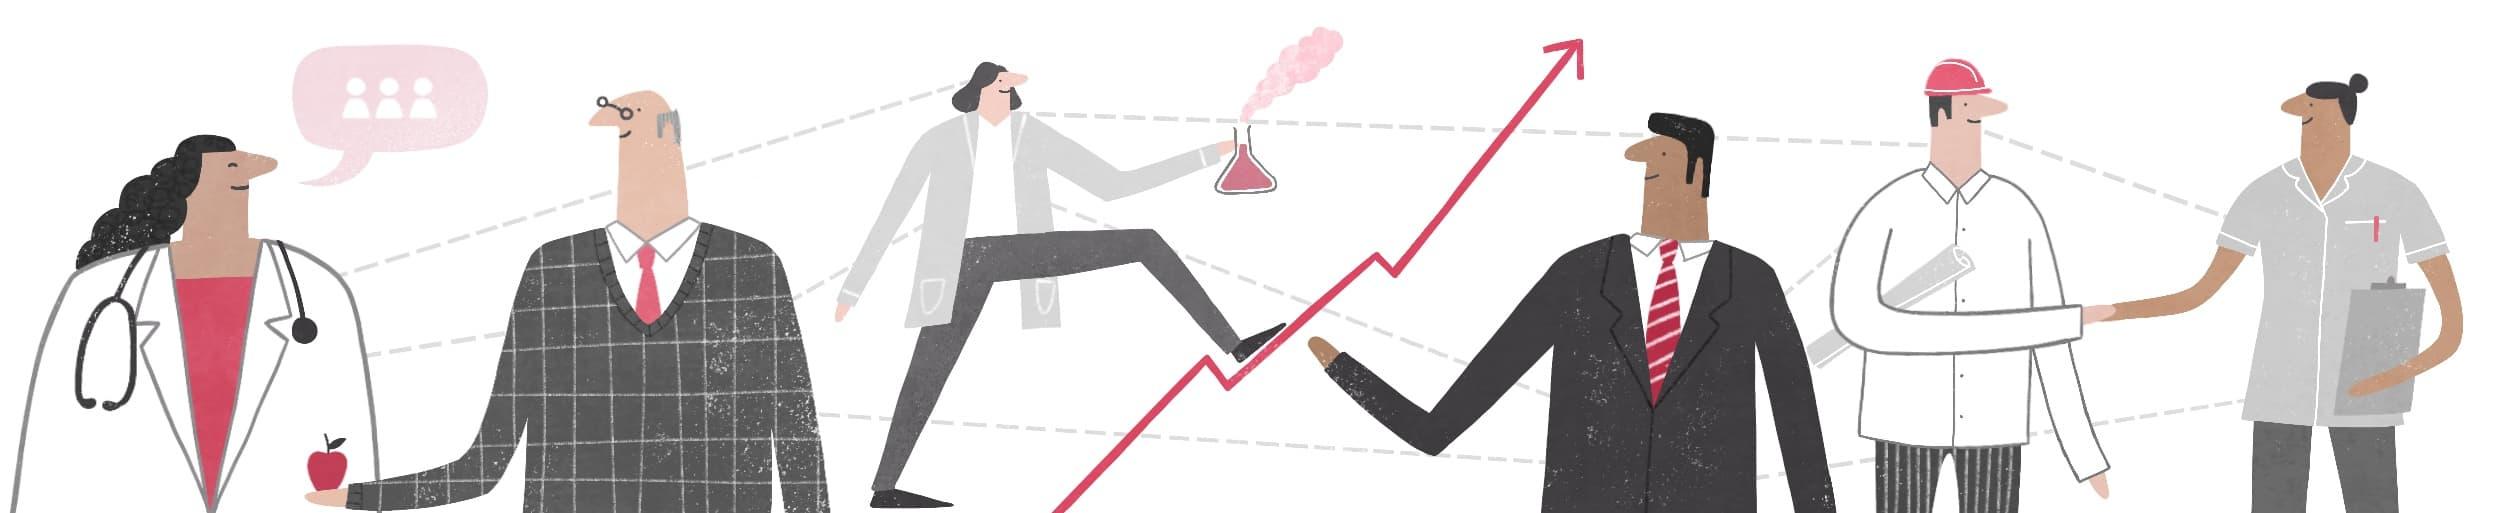 Membership market research